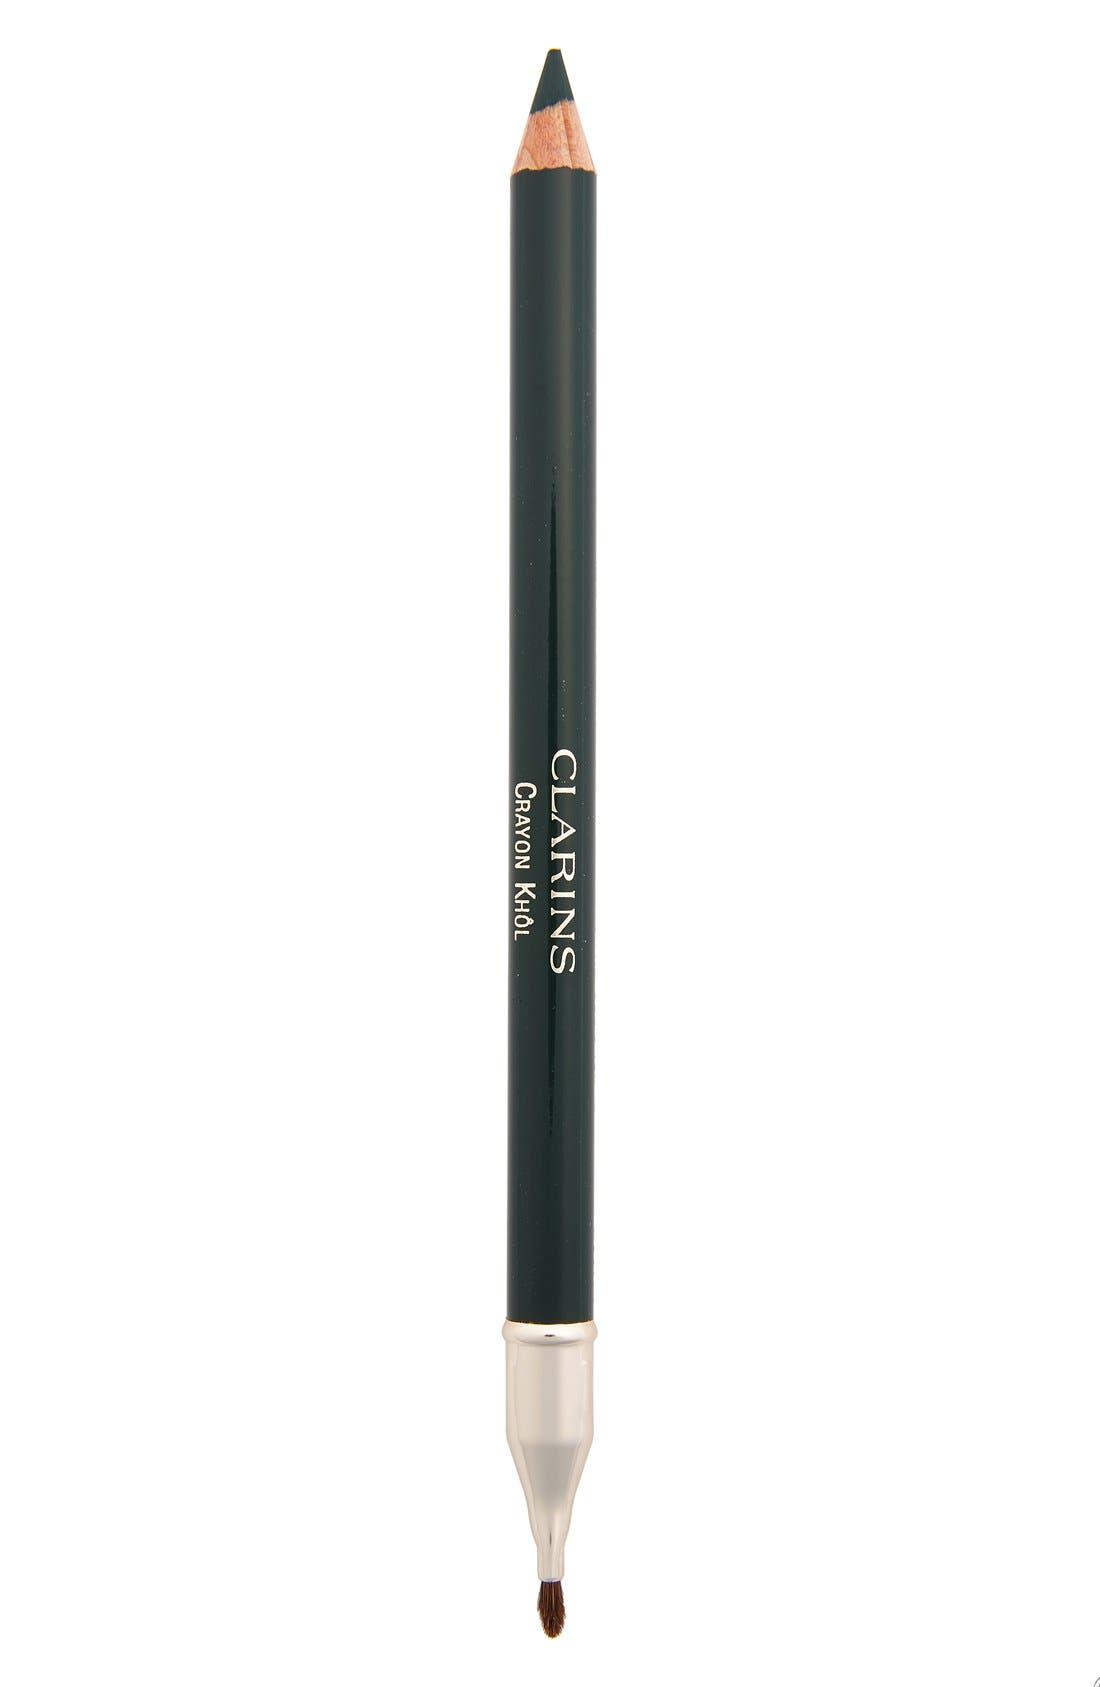 Clarins Crayon Khôl Eyeliner Pencil